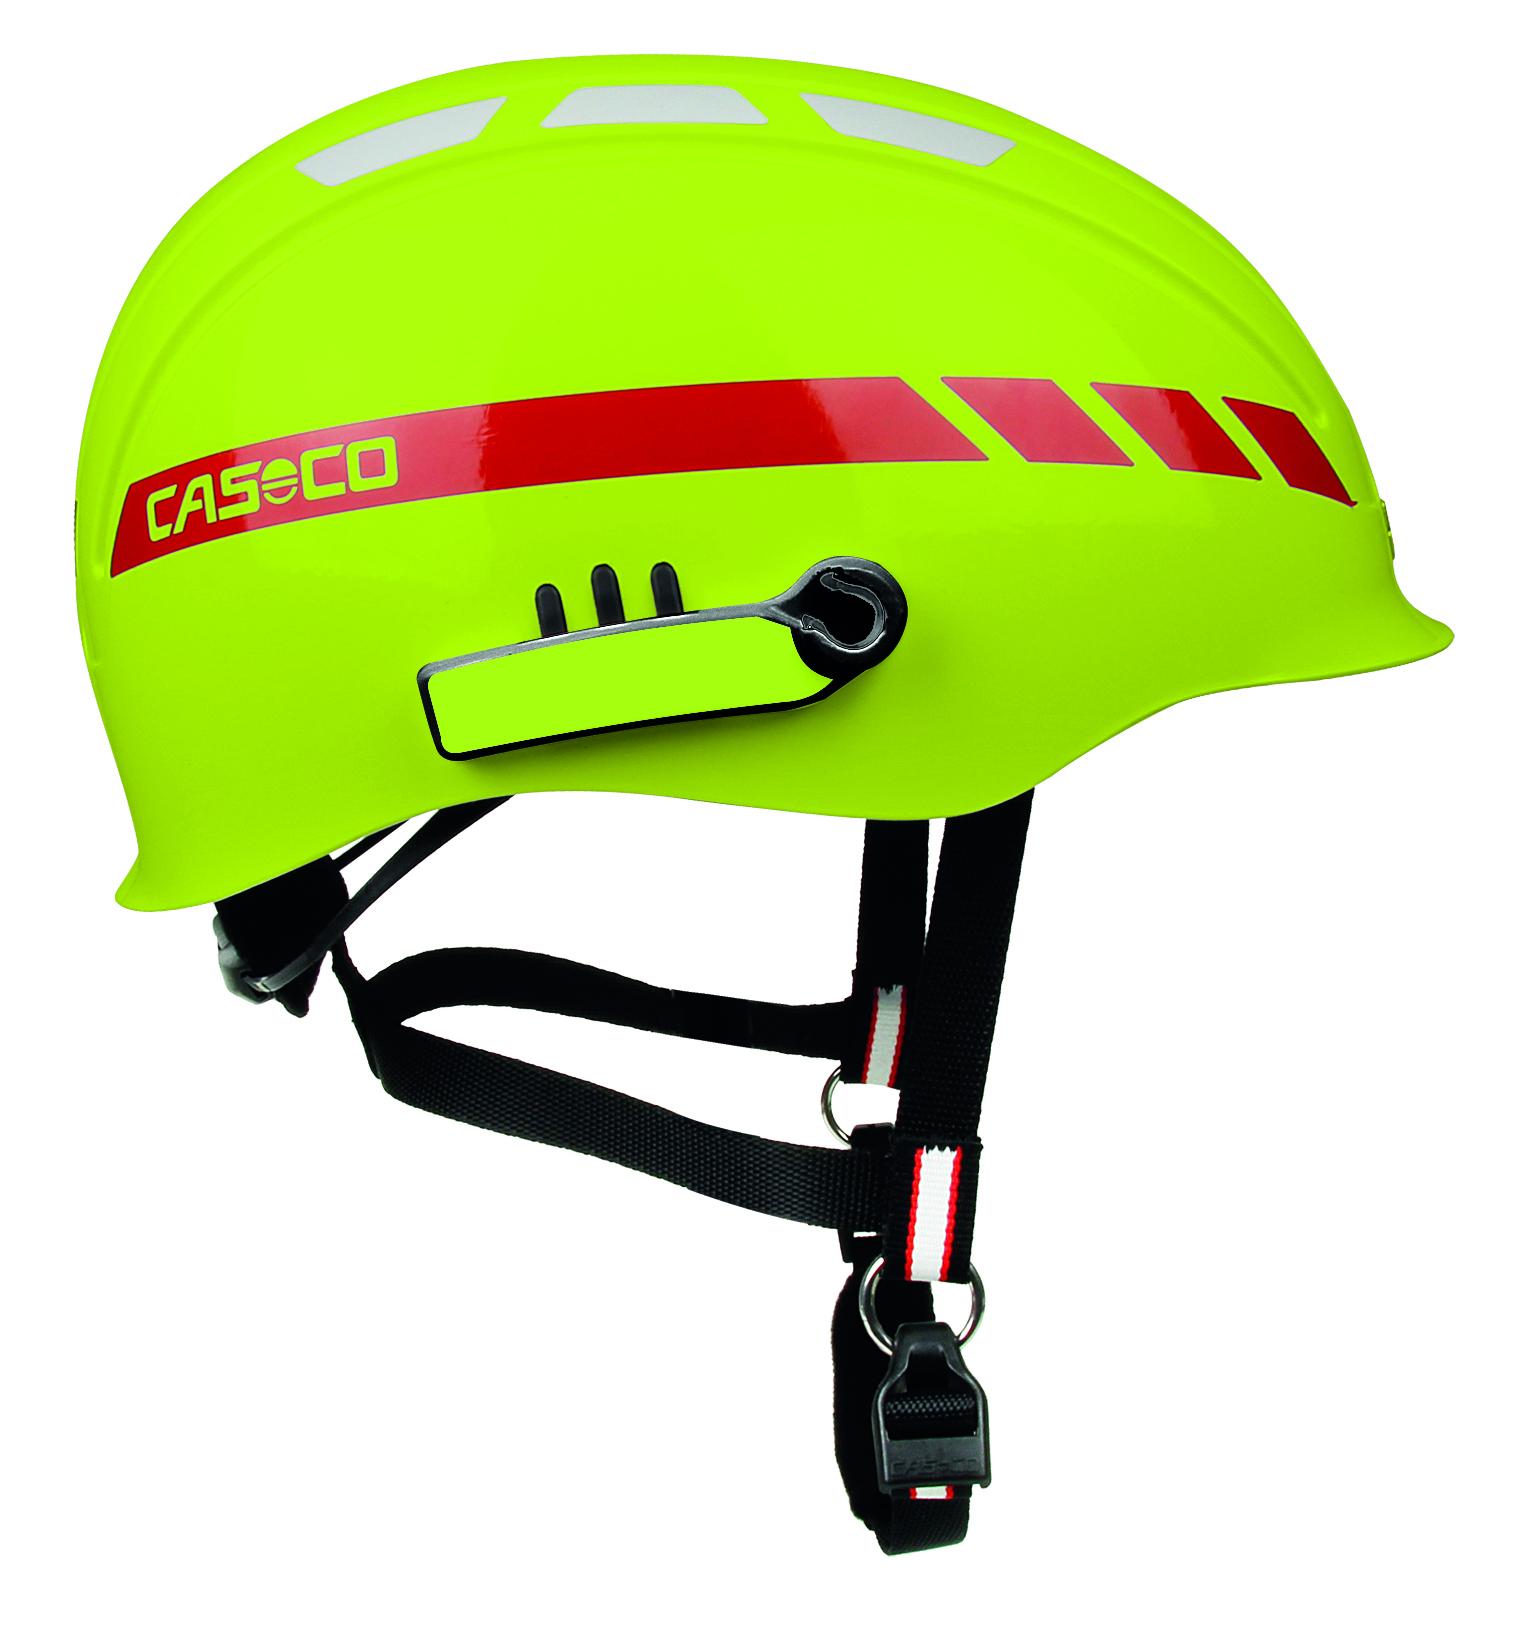 Casco Helm PF 100 Rescu, neon-gelb